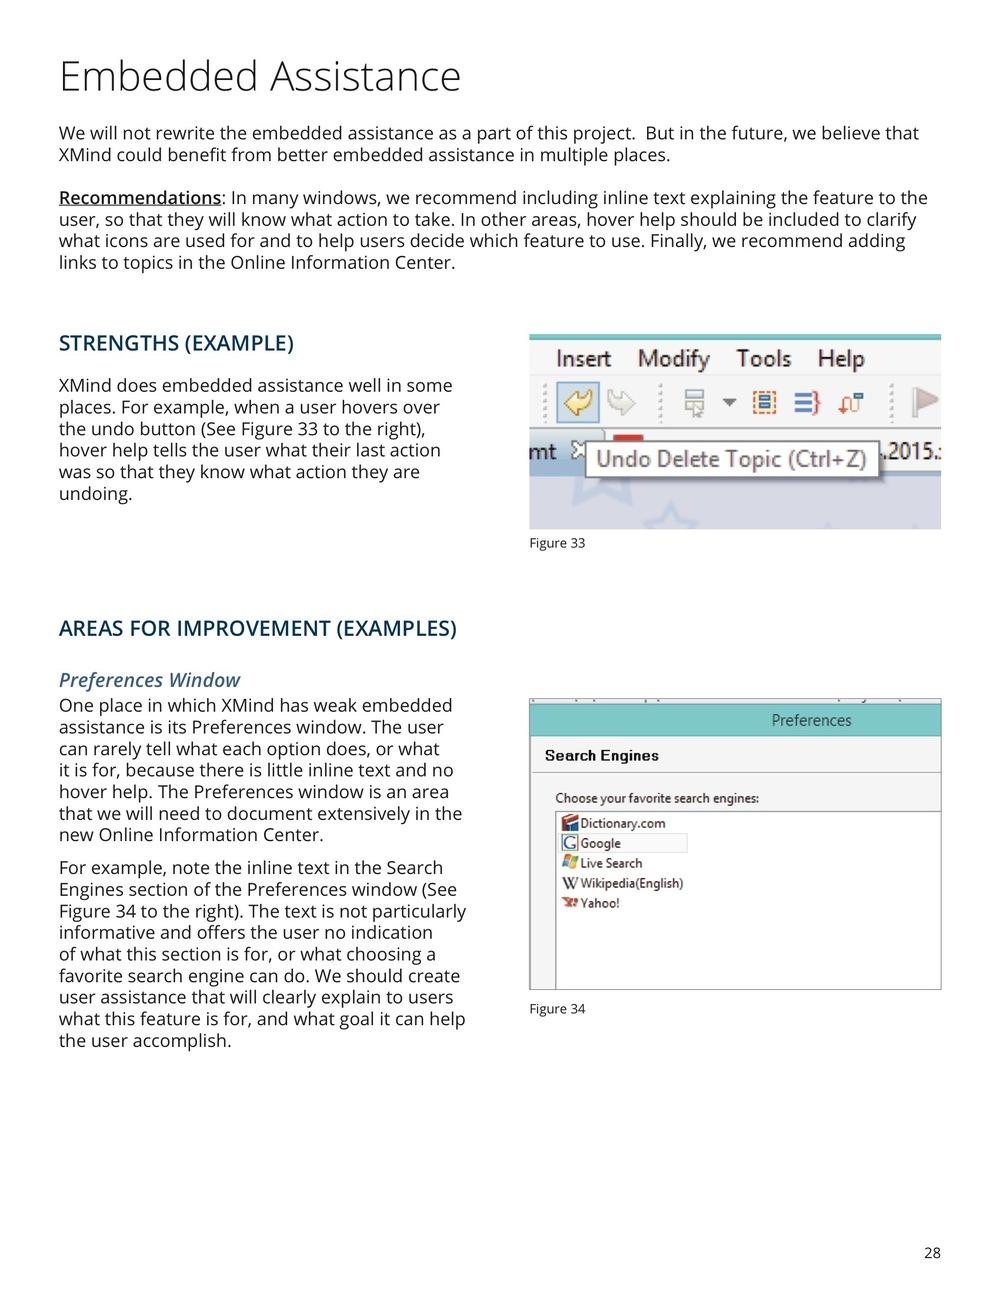 XMind Final Report_4-23-15 28-28.jpeg